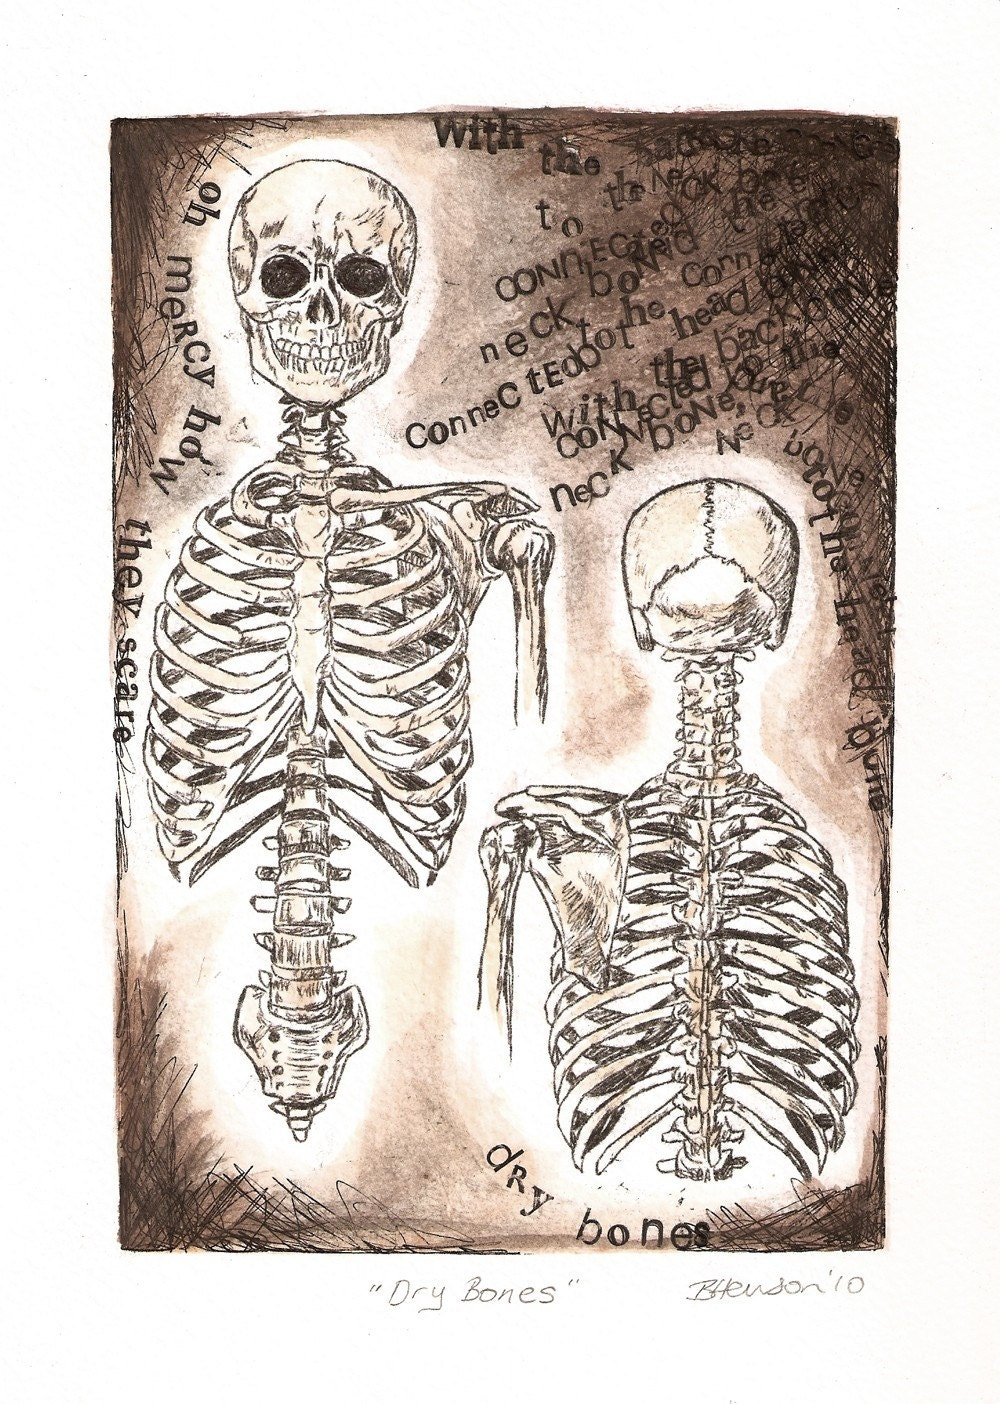 Anatomy Art Dry Bones Skeleton drawing The neck bone is | Etsy